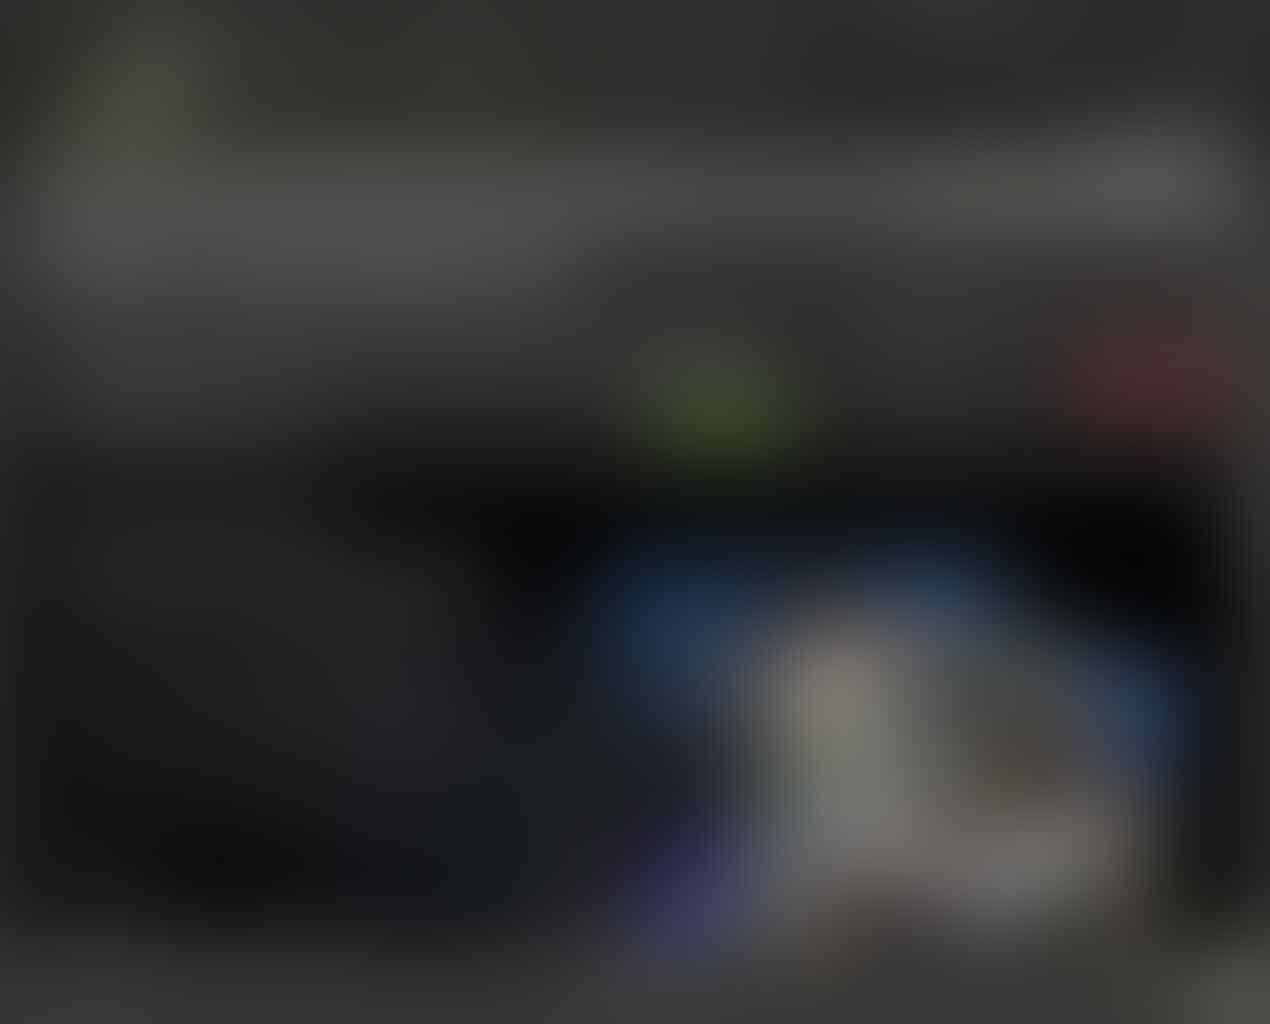 PC Game Original | Game Steam Origin Uplay | Jasa Beli Game Flat Fee 10.000 (Bogor)